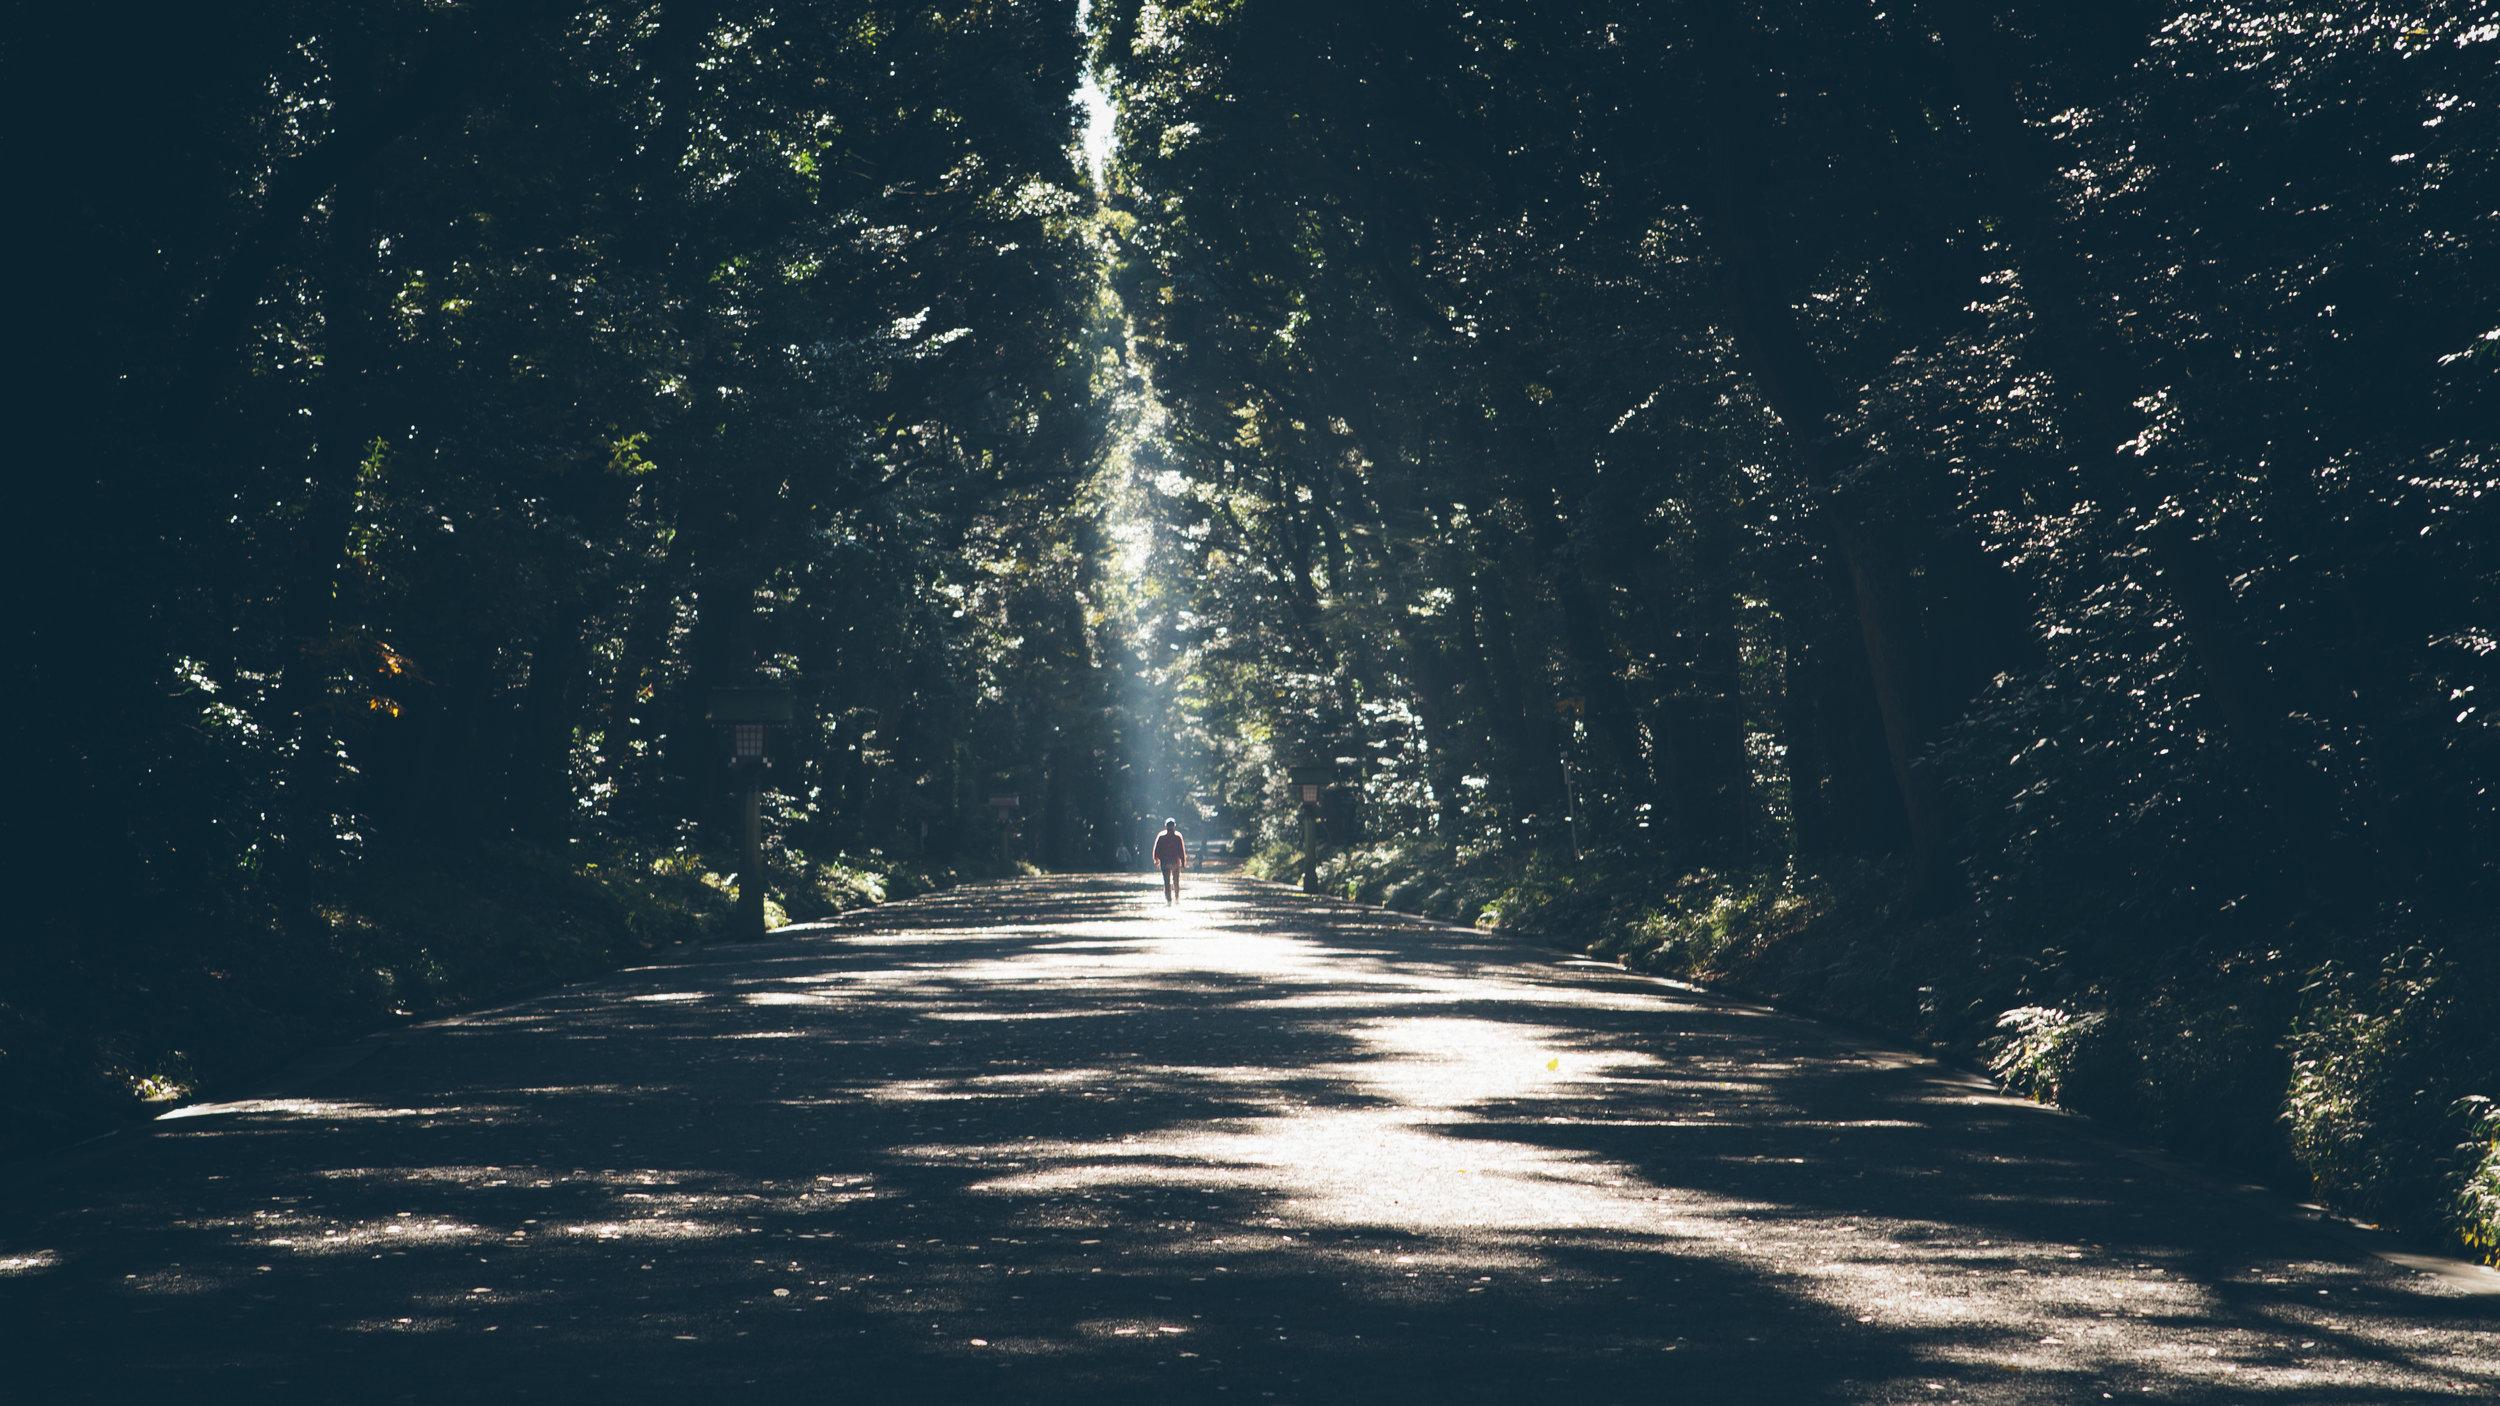 Walk the road